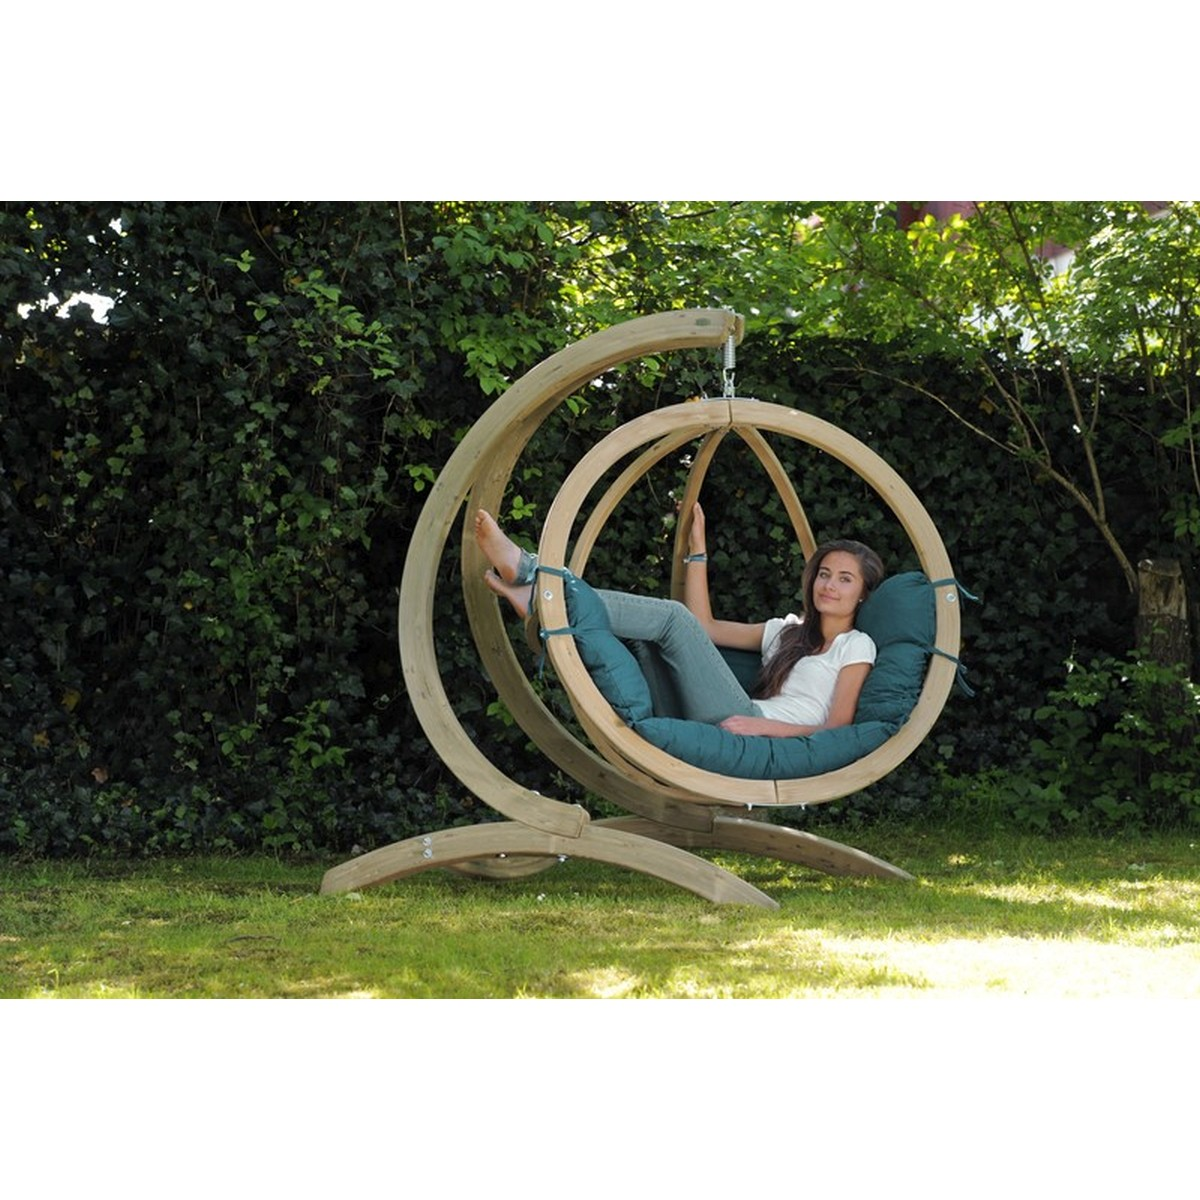 Amazonas fauteuil suspendu globo chair vert avec support bois - Fauteuil suspendu avec support ...